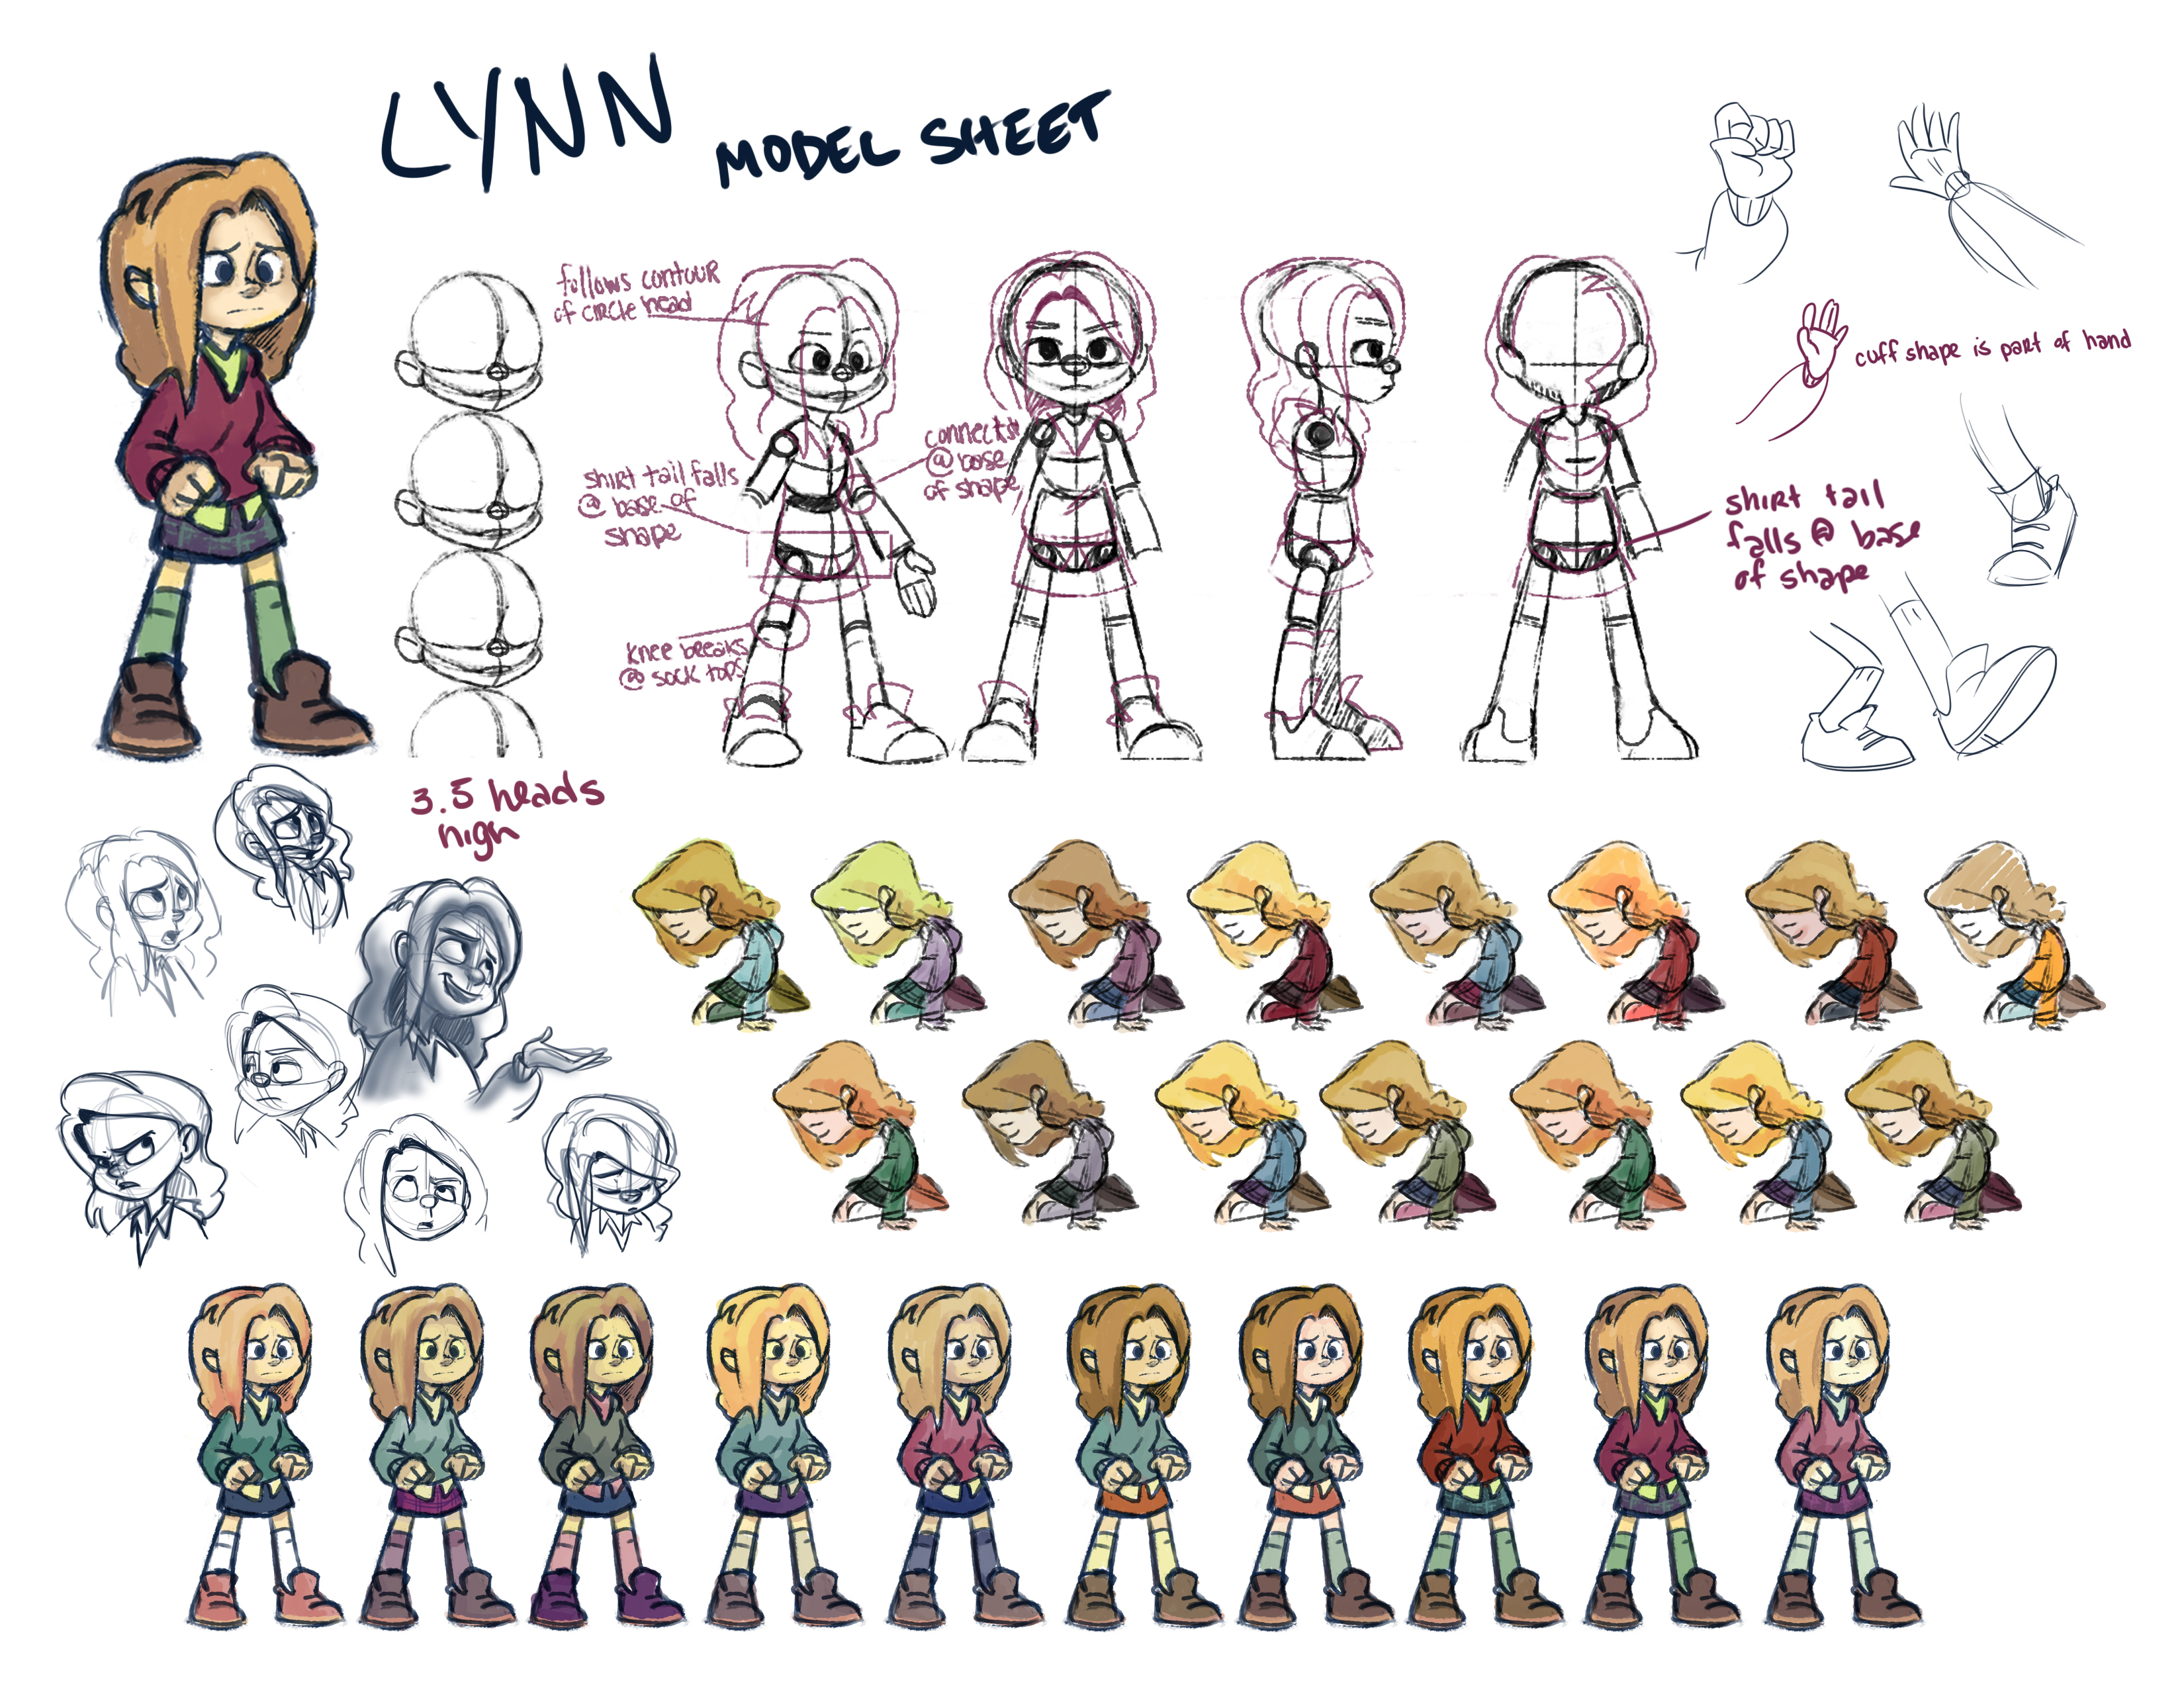 Lynn Model Sheet